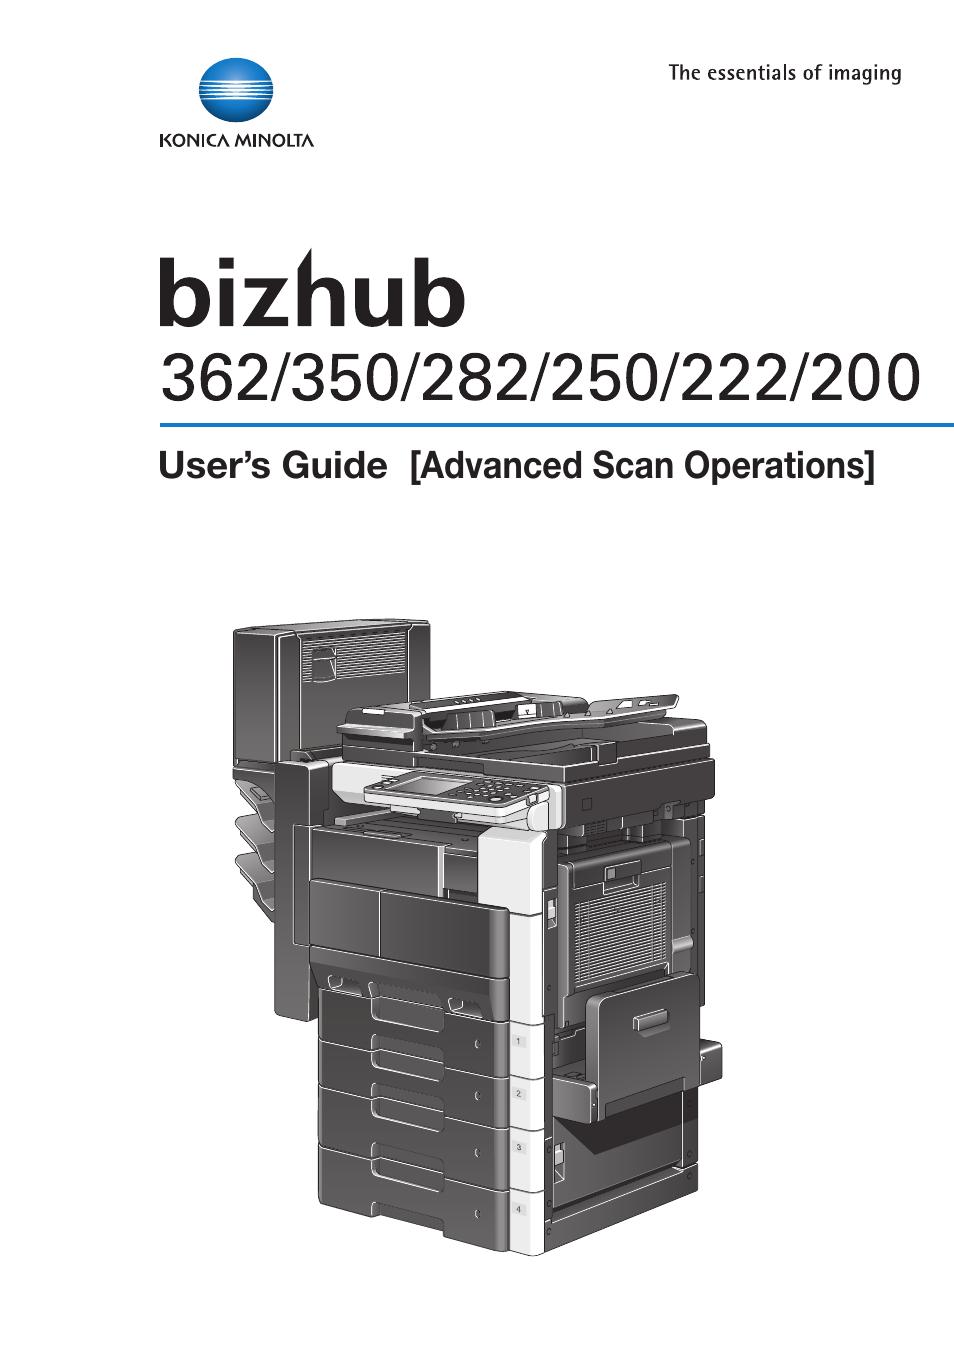 Konica Minolta bizhub 282 User Manual | 288 pages | Also for: bizhub 200, bizhub  222, bizhub 362, BIZHUB 350, BIZHUB 250